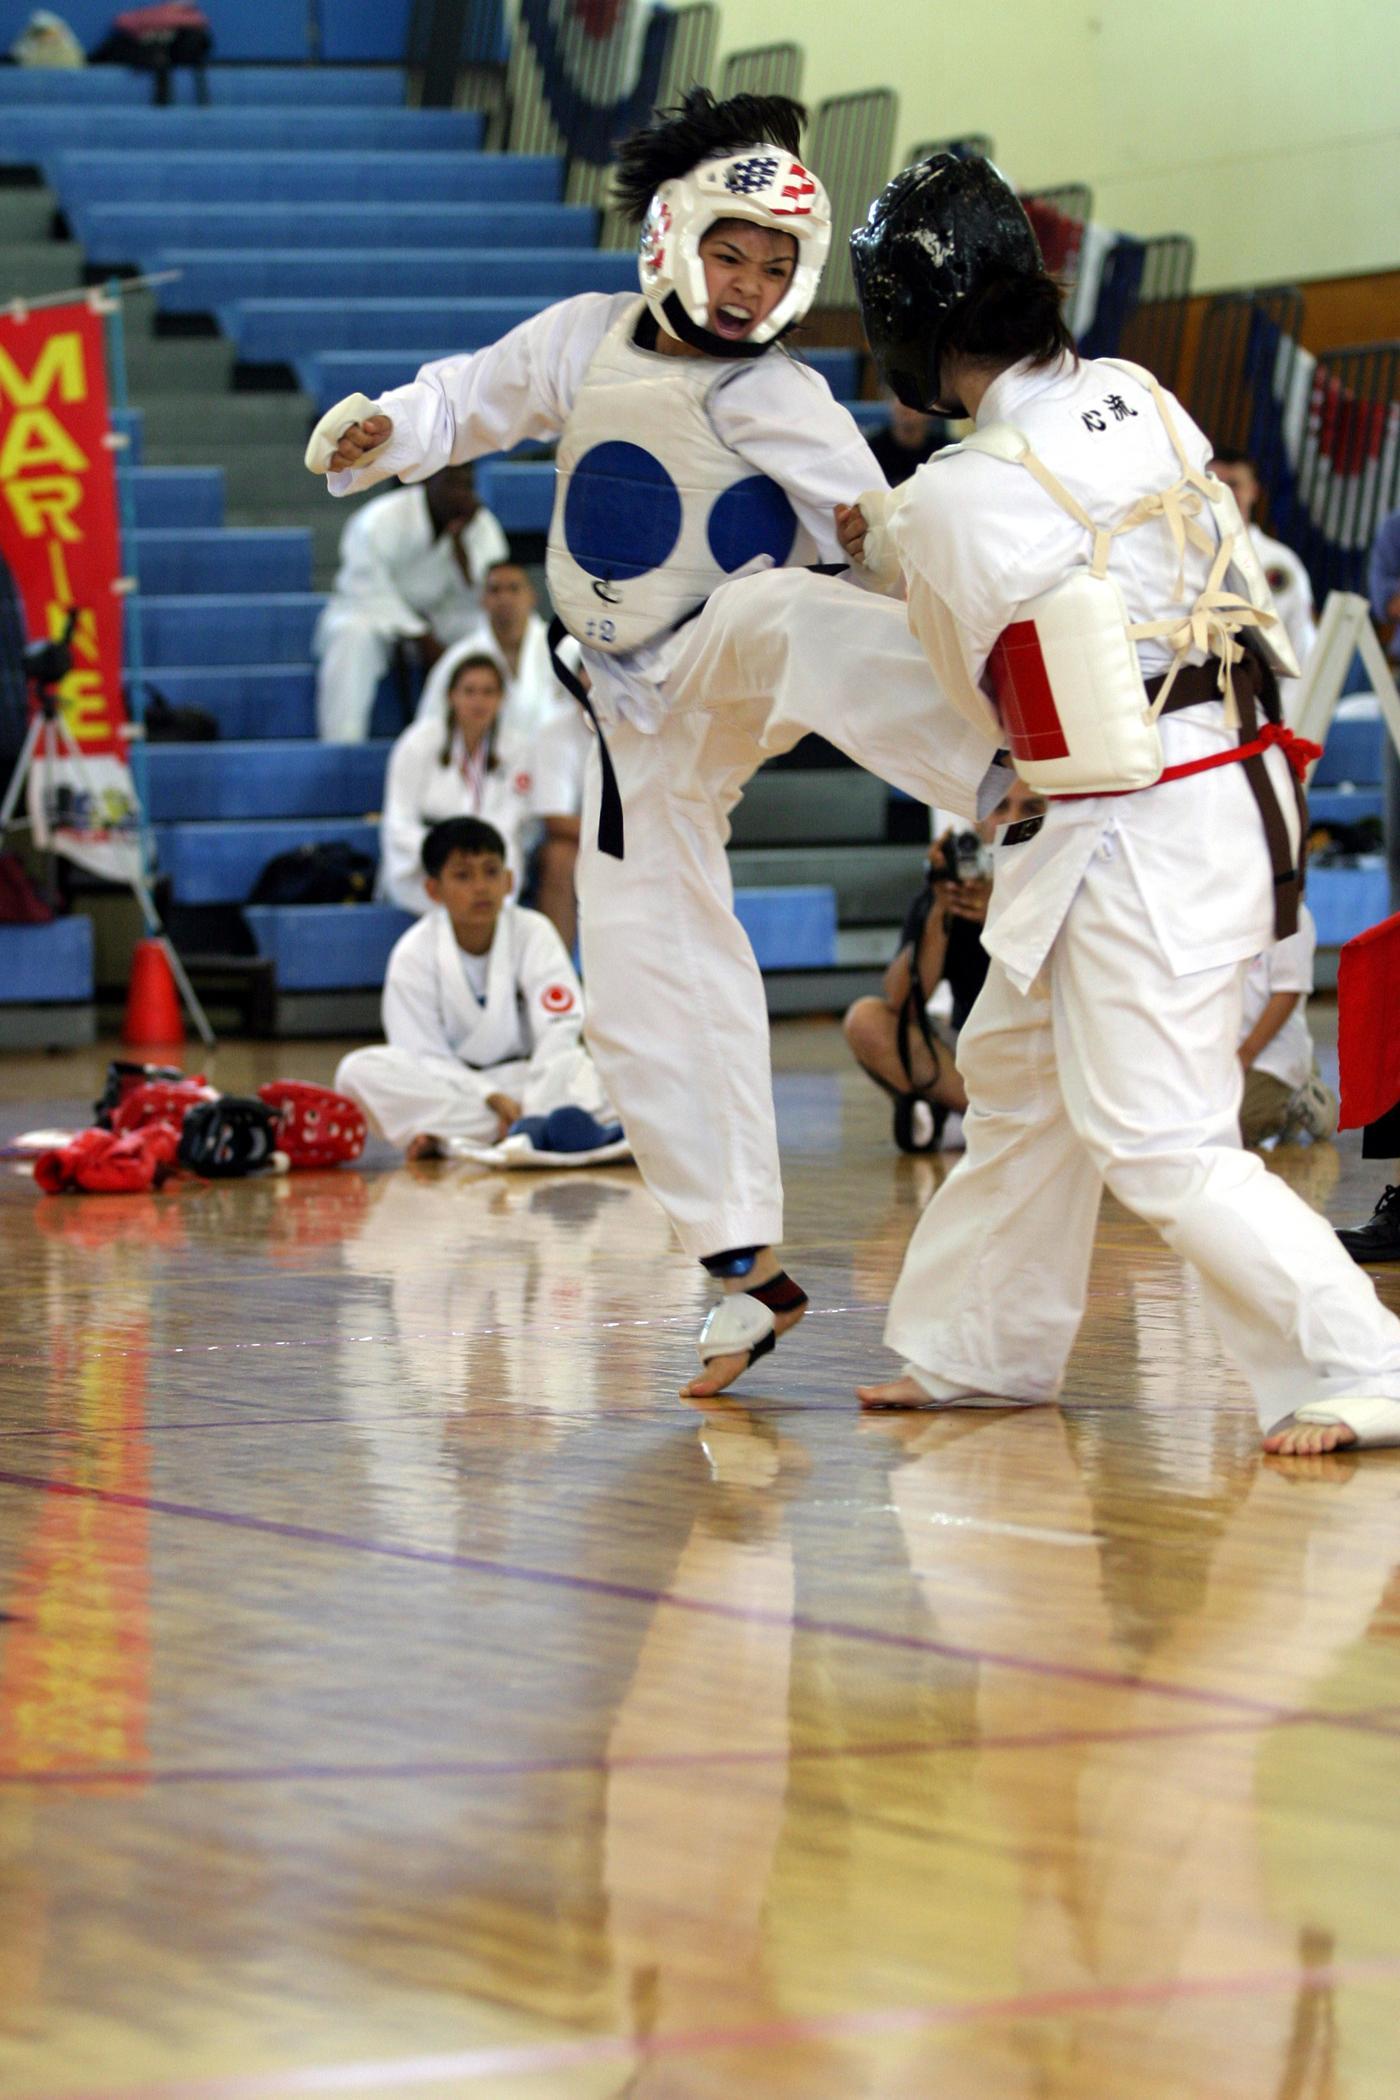 karate 2004: